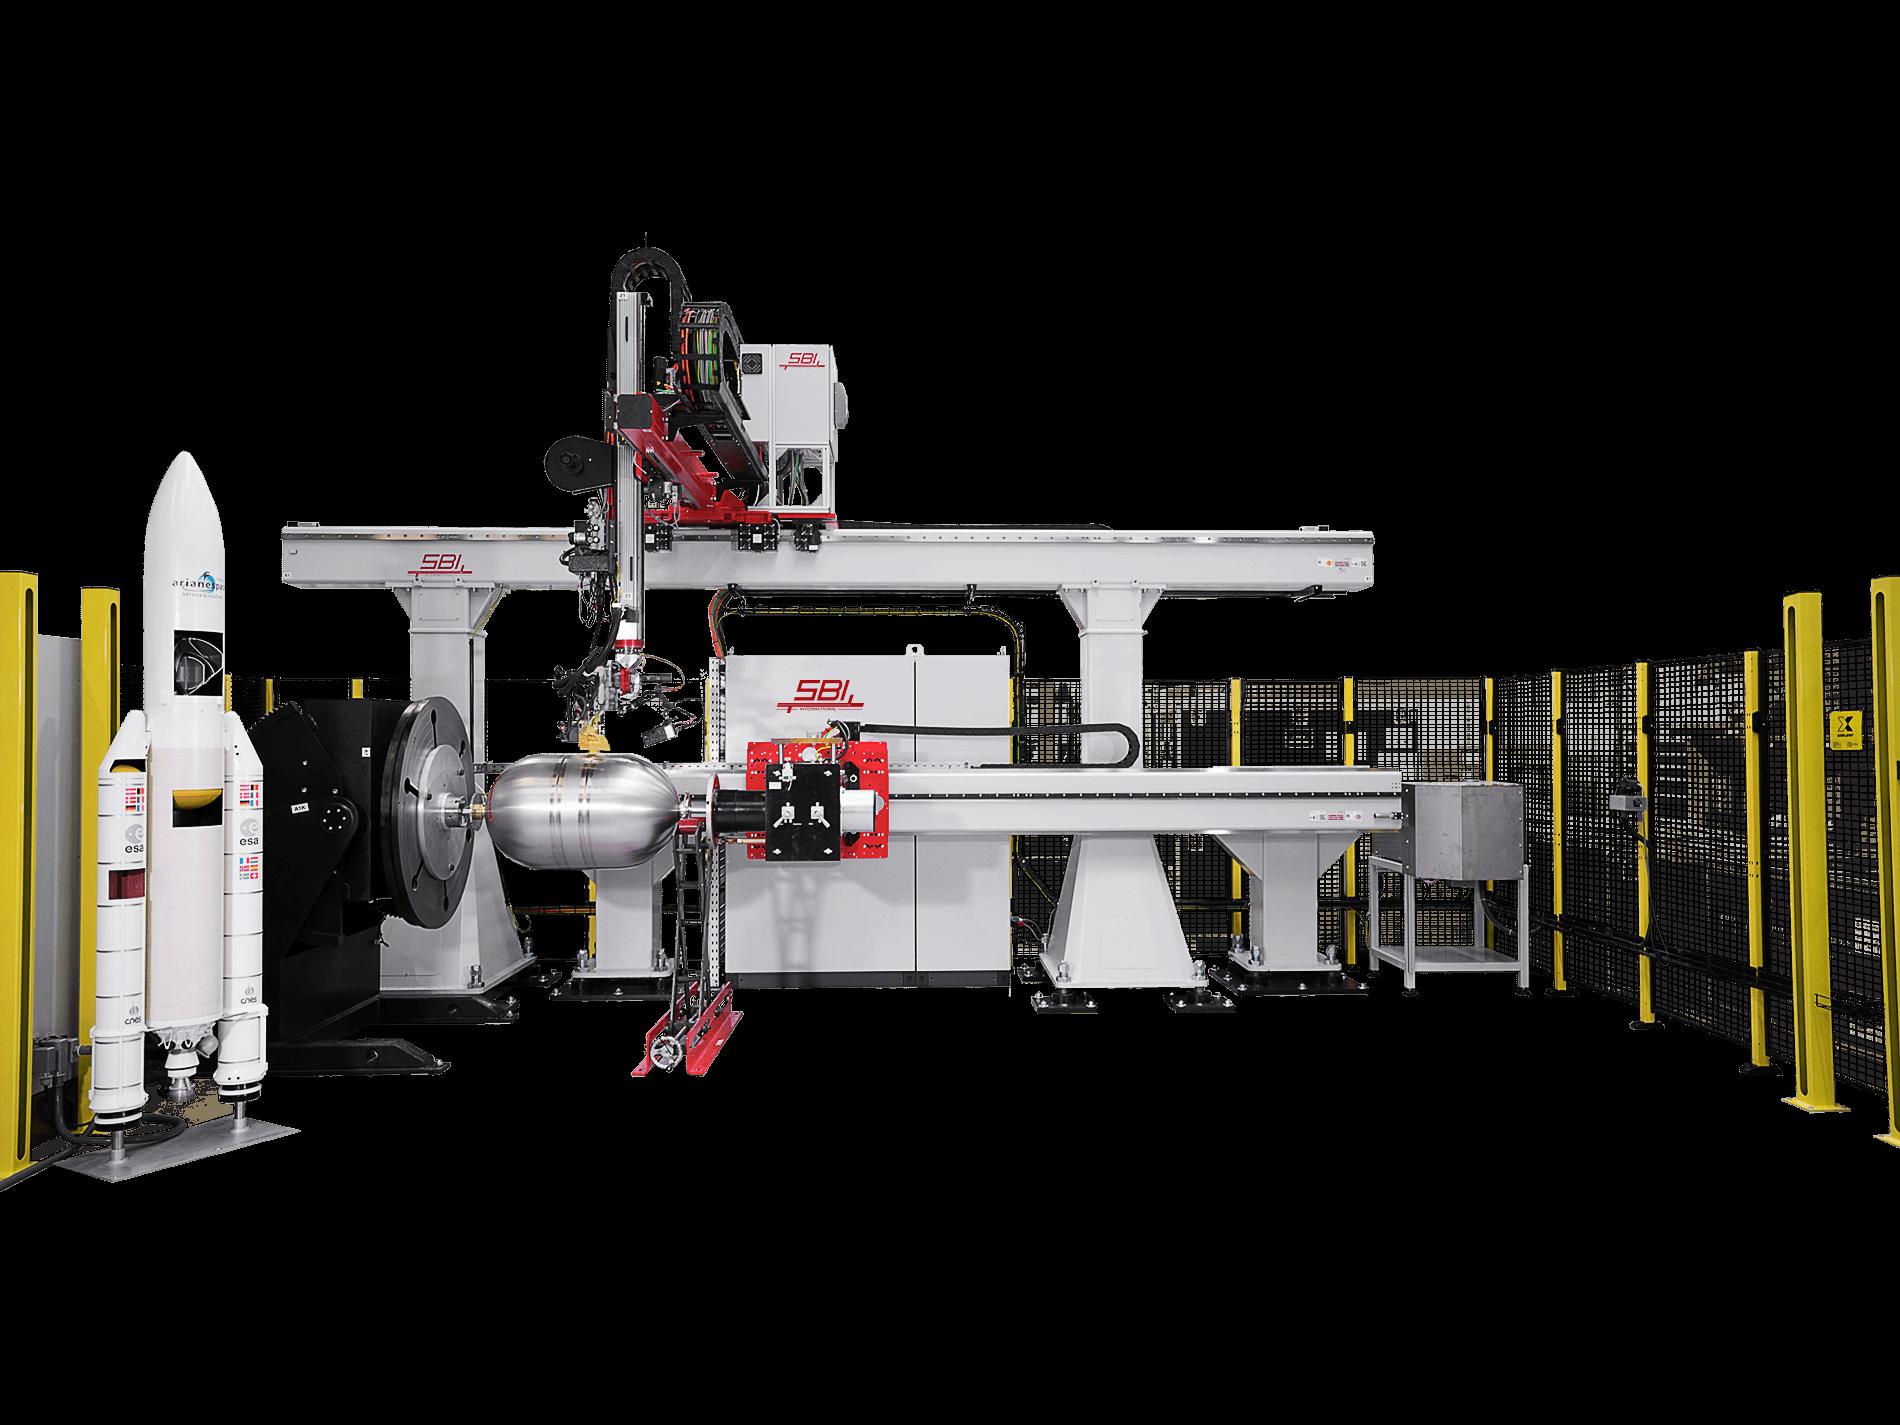 SBI's tank welding system. Image via SBI.